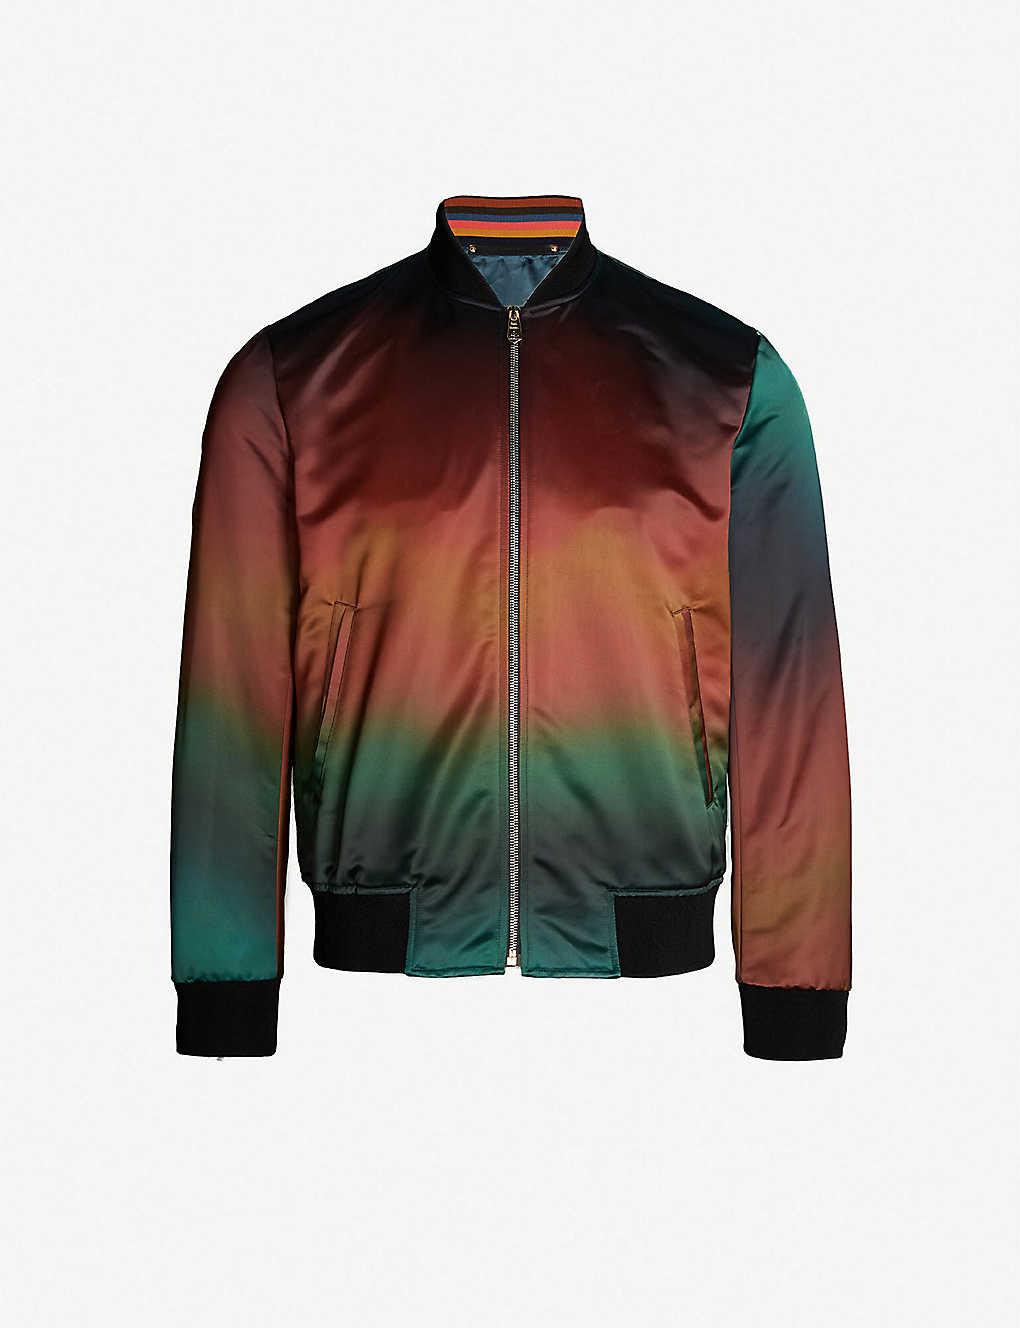 e3d7cace2b2 PAUL SMITH - Tie-dye satin bomber jacket   Selfridges.com